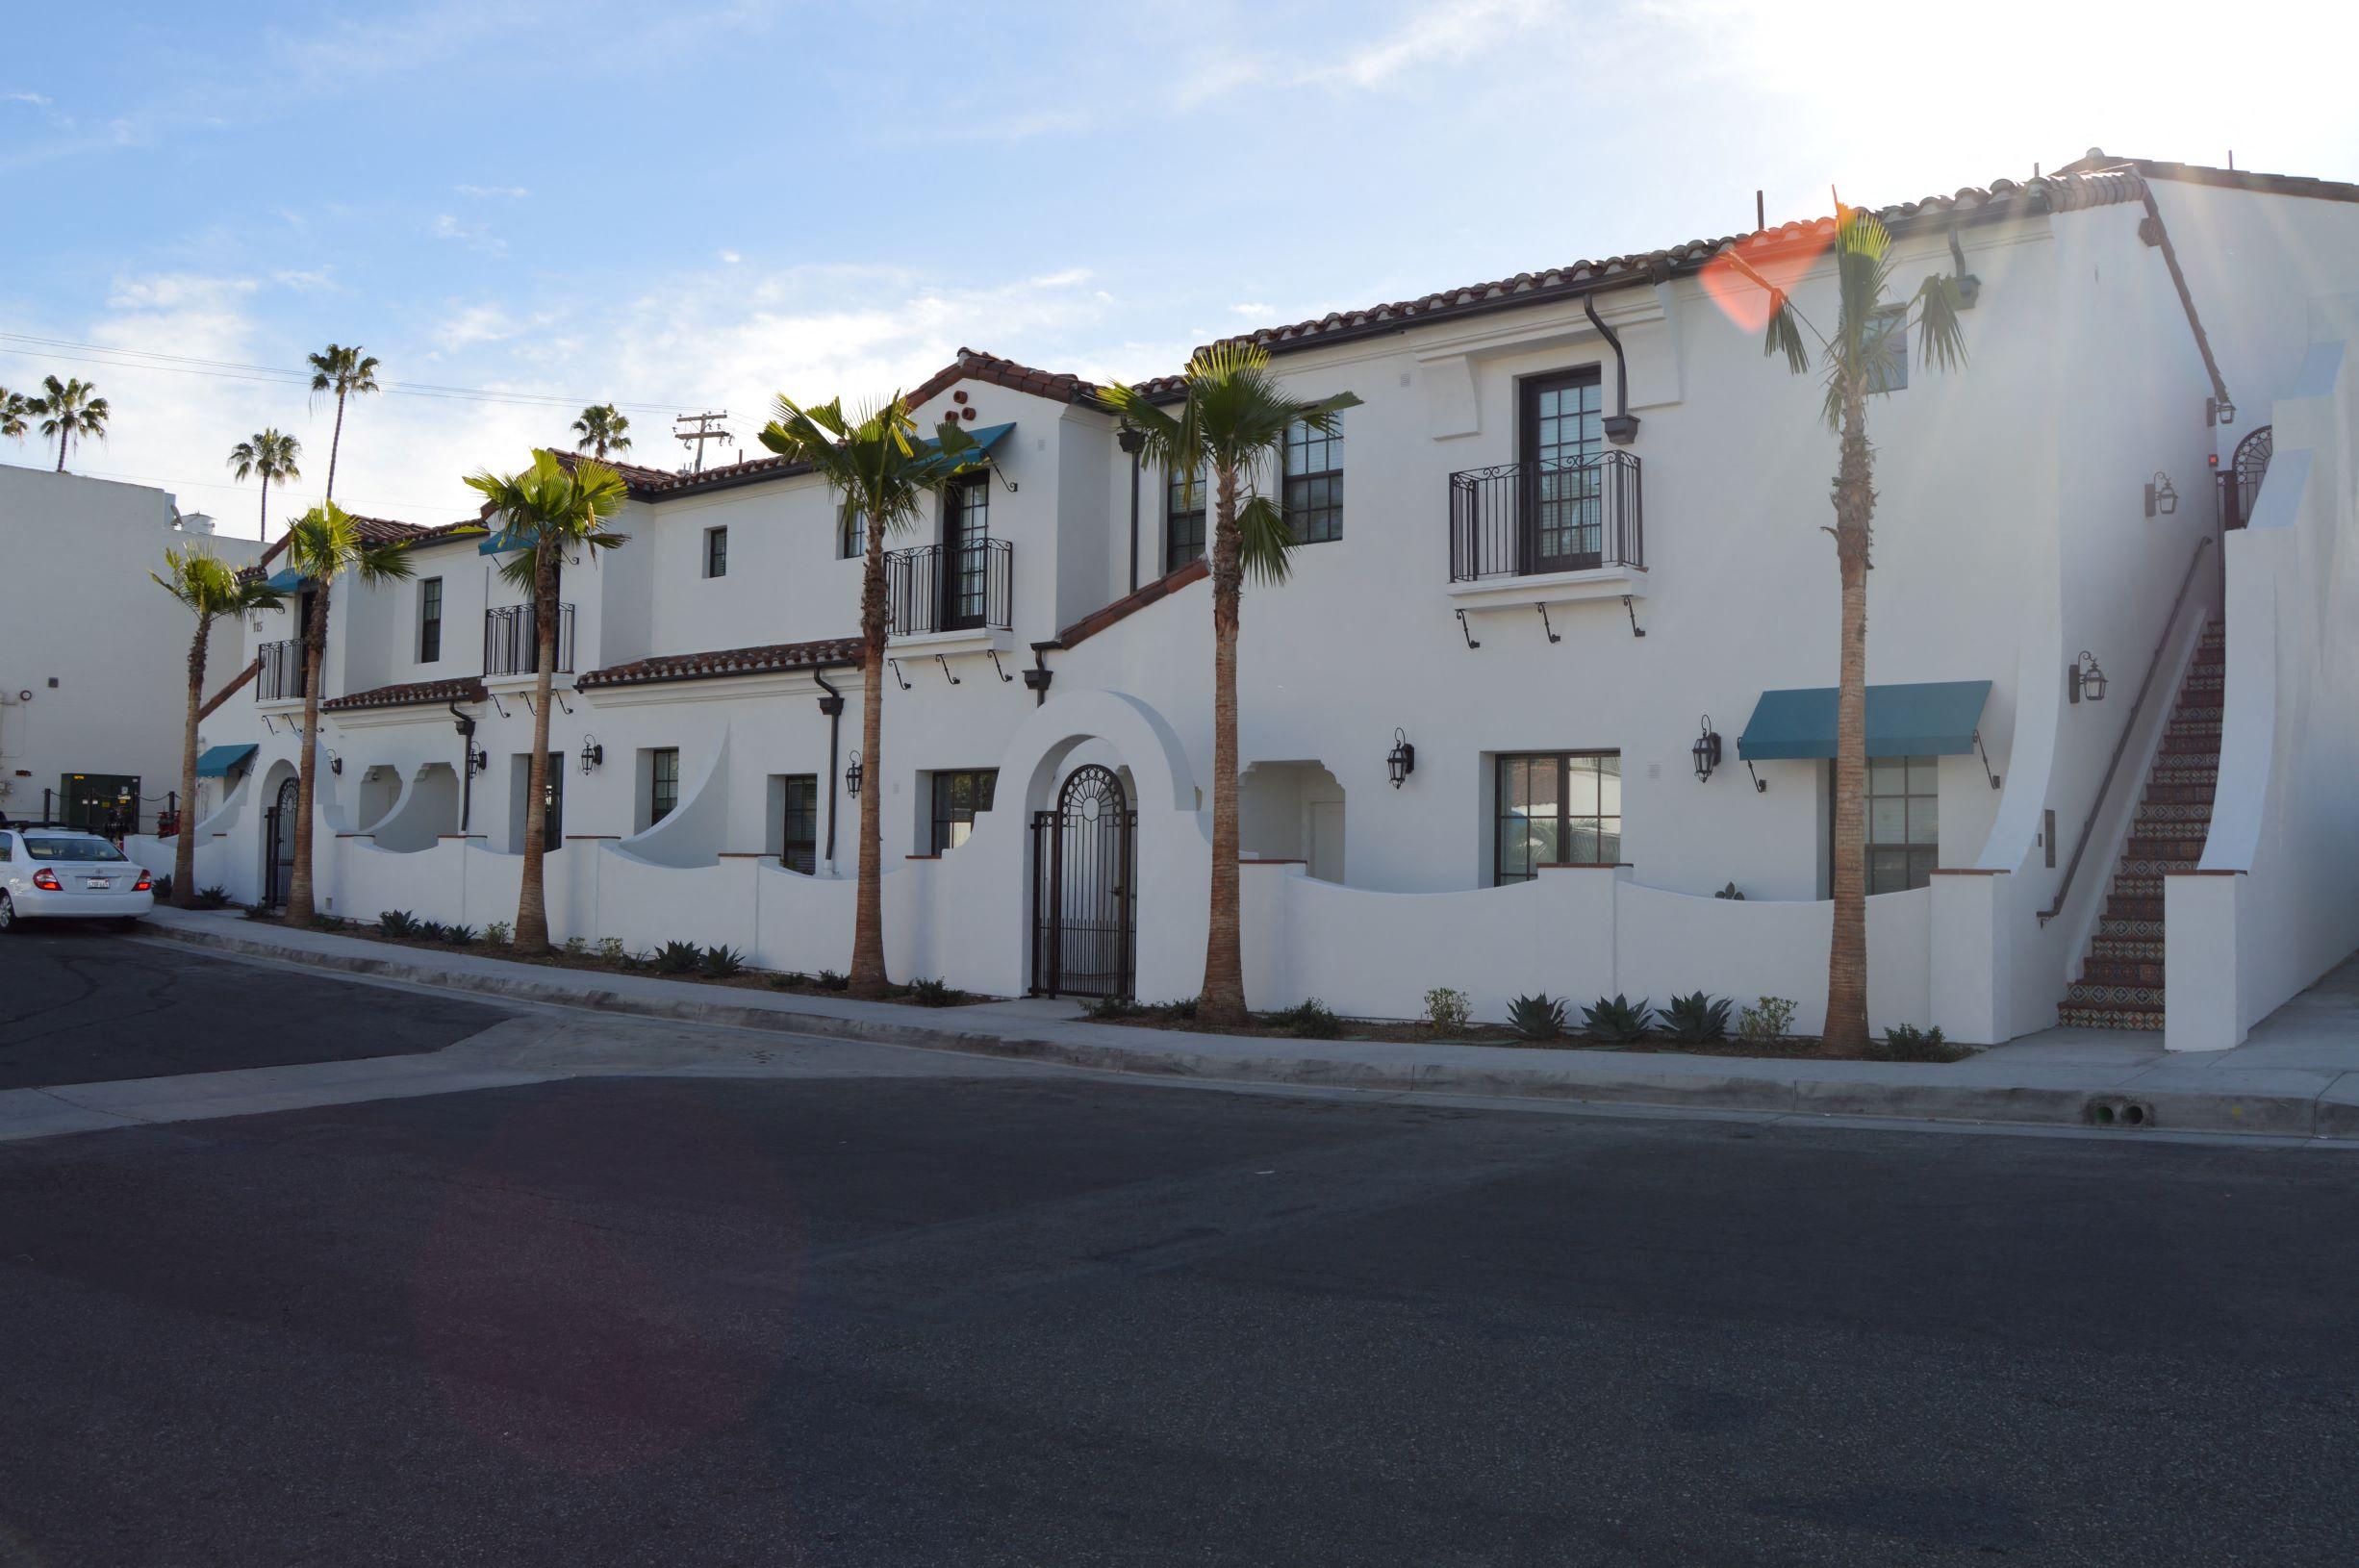 Las Palmas Village Street View